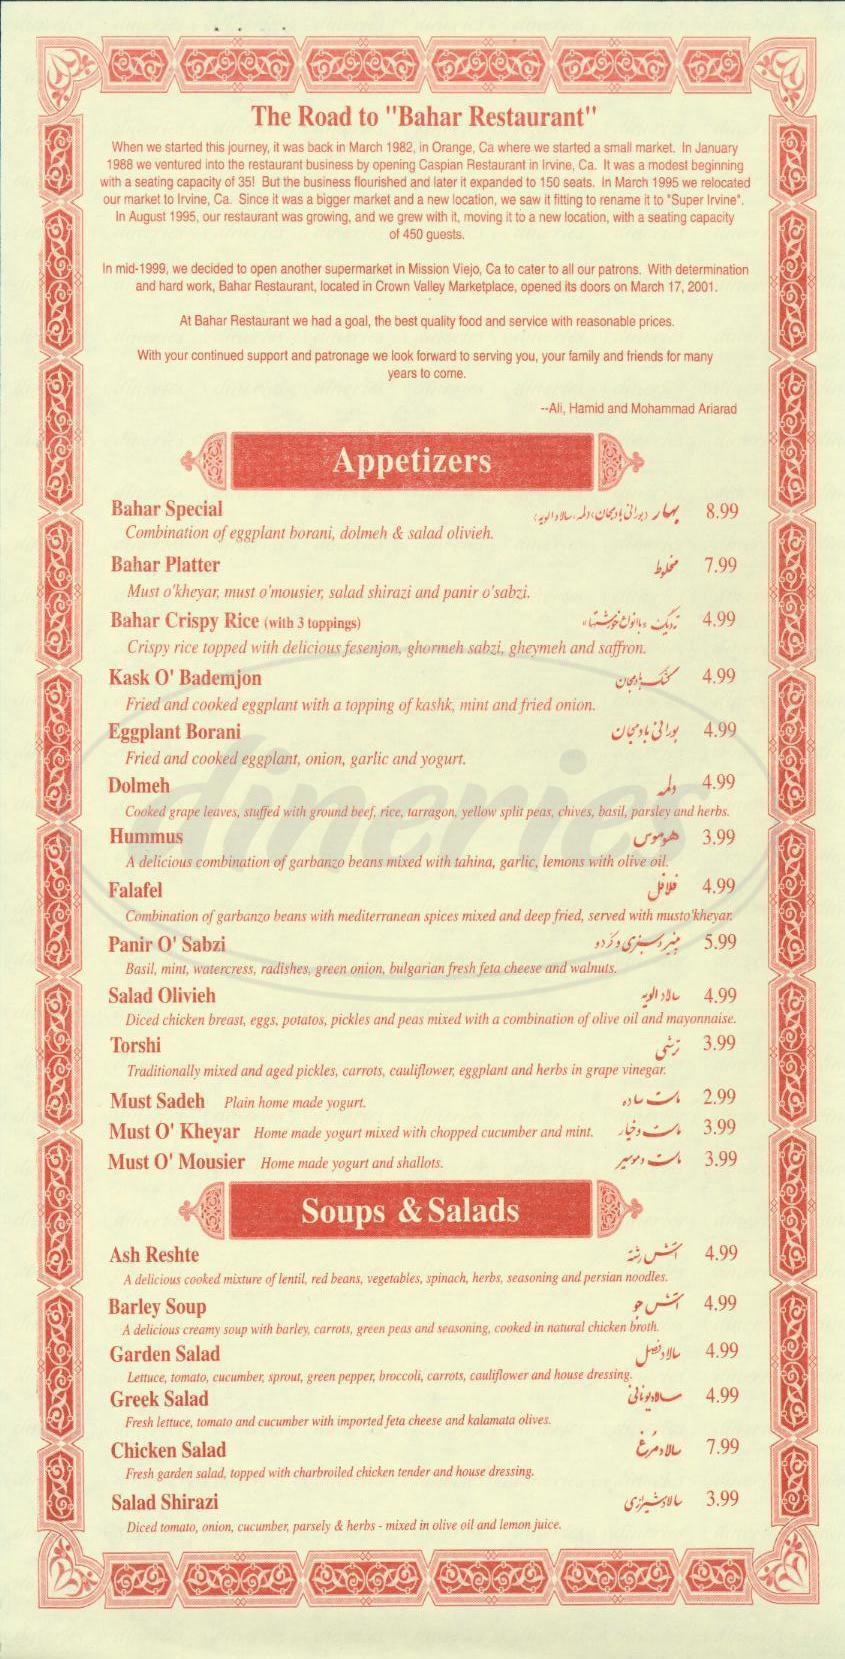 menu for Bahar Restaurant